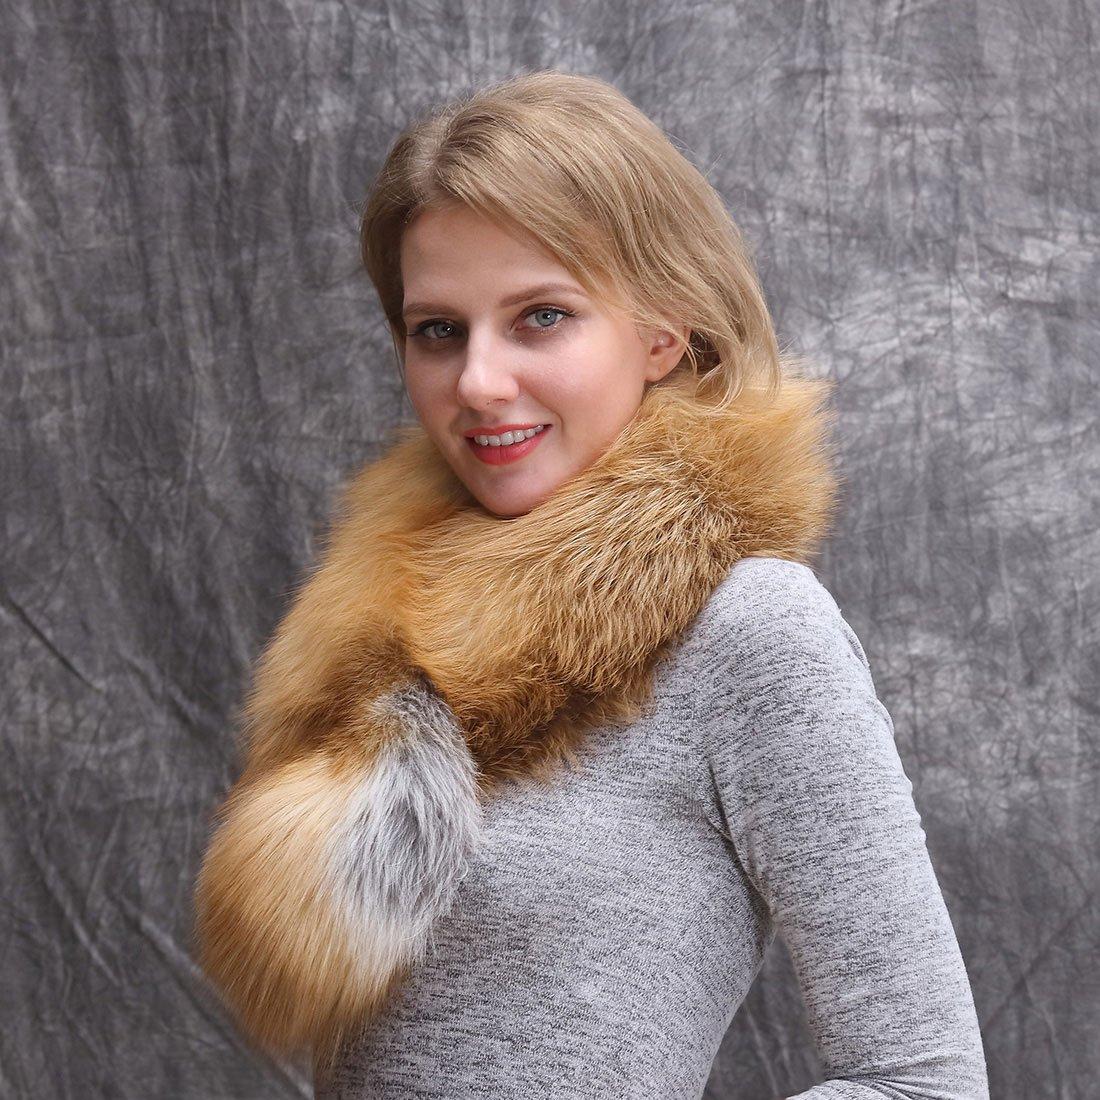 Real Fox Fur Scarf for Women-Sleeveless Fur Shawl,Neck Warm Fur Collar for Evening Party Wedding Gift-006